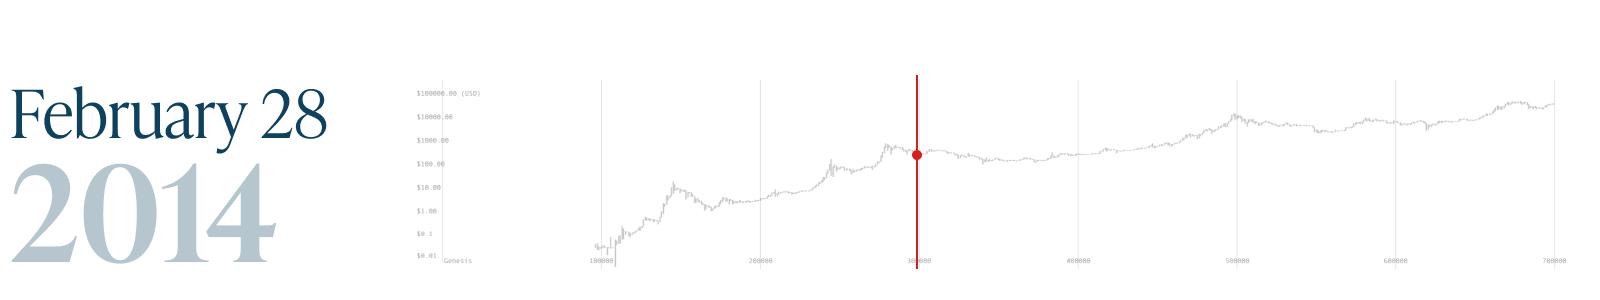 Monochrome_Bitcoin Block 700k_28 Feb 2014.png